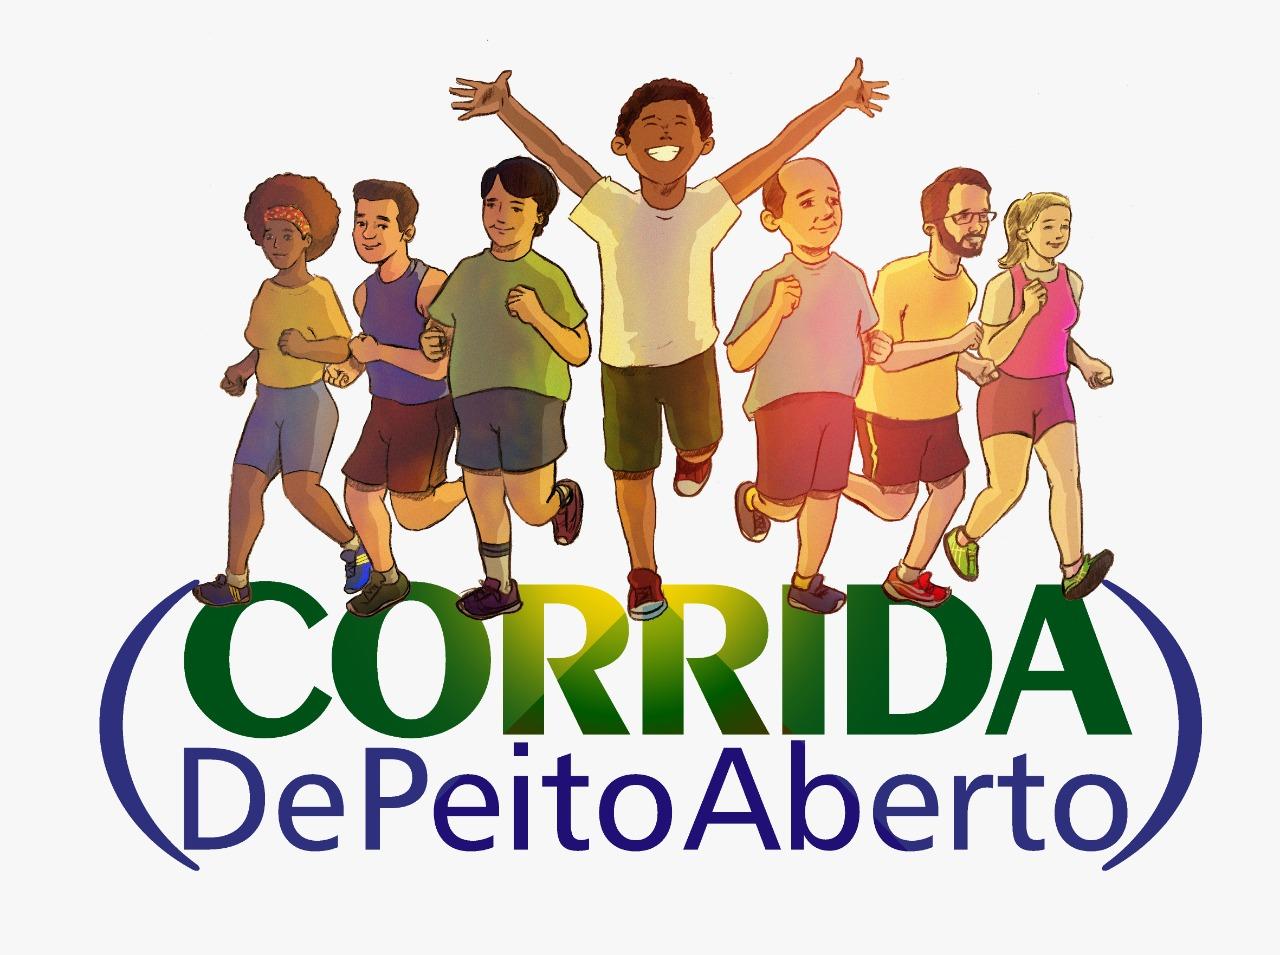 CORRIDA DE PEITO ABERTO